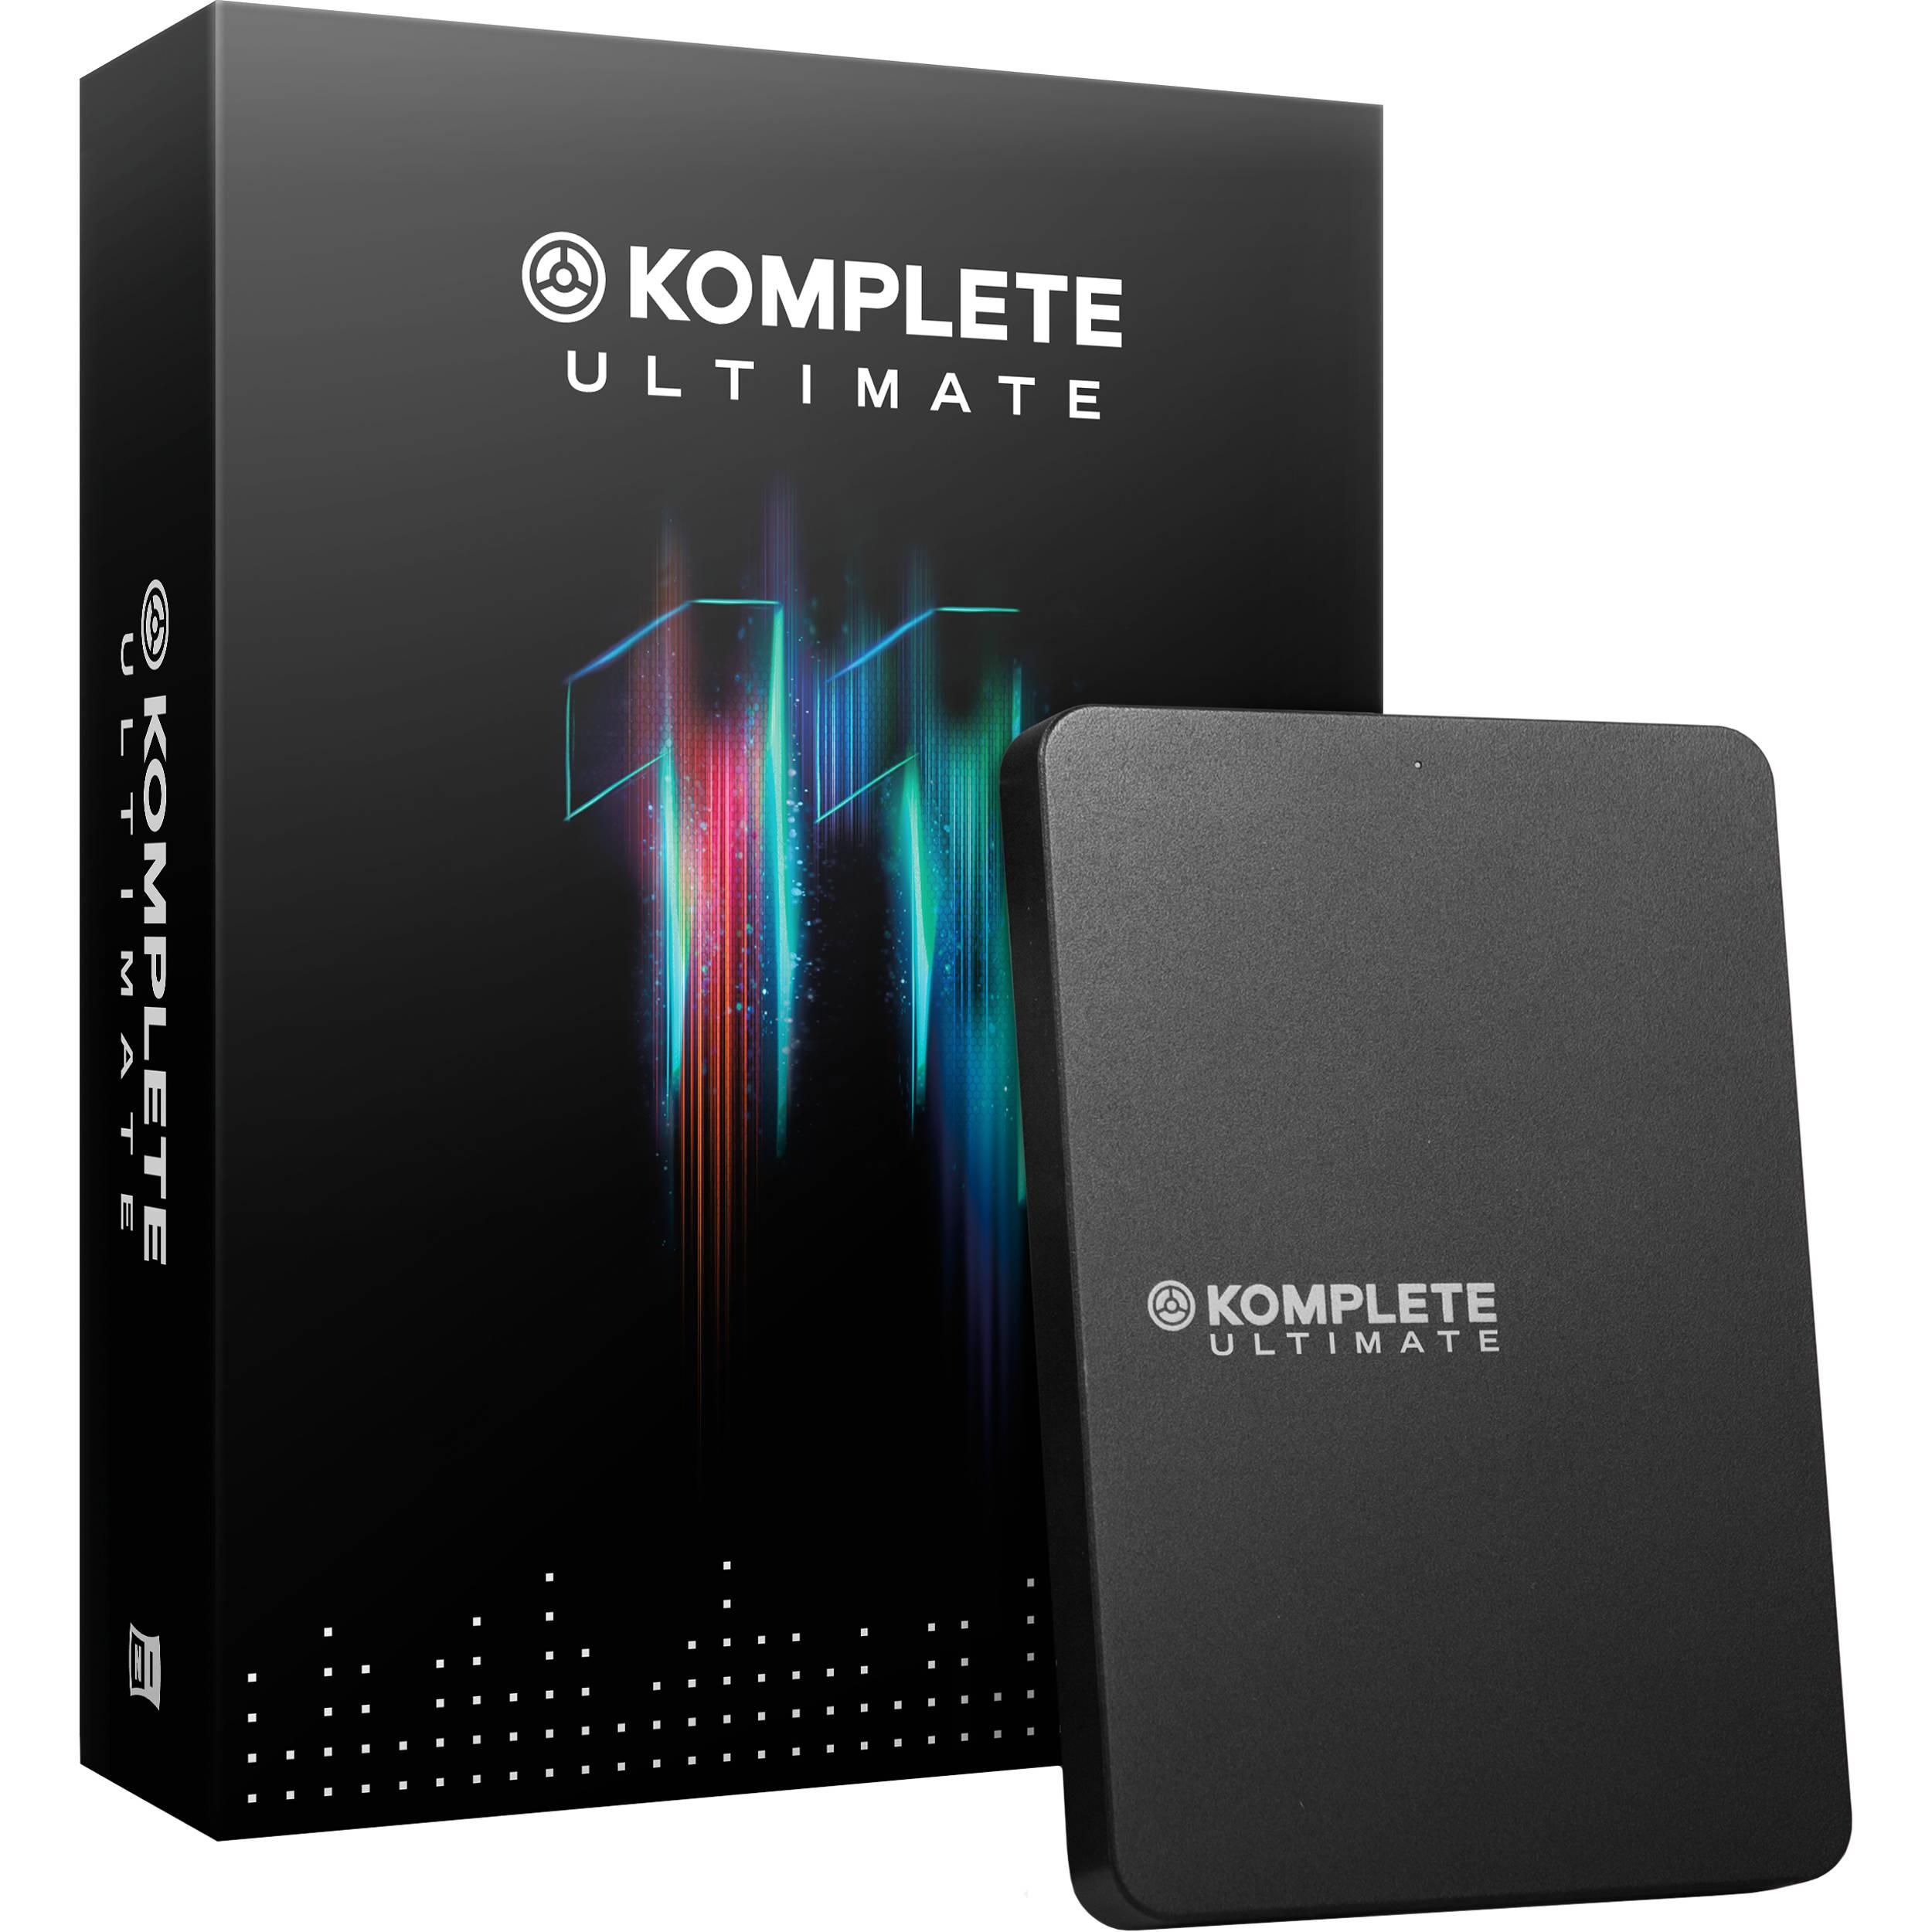 komplete ultimate 10 installer